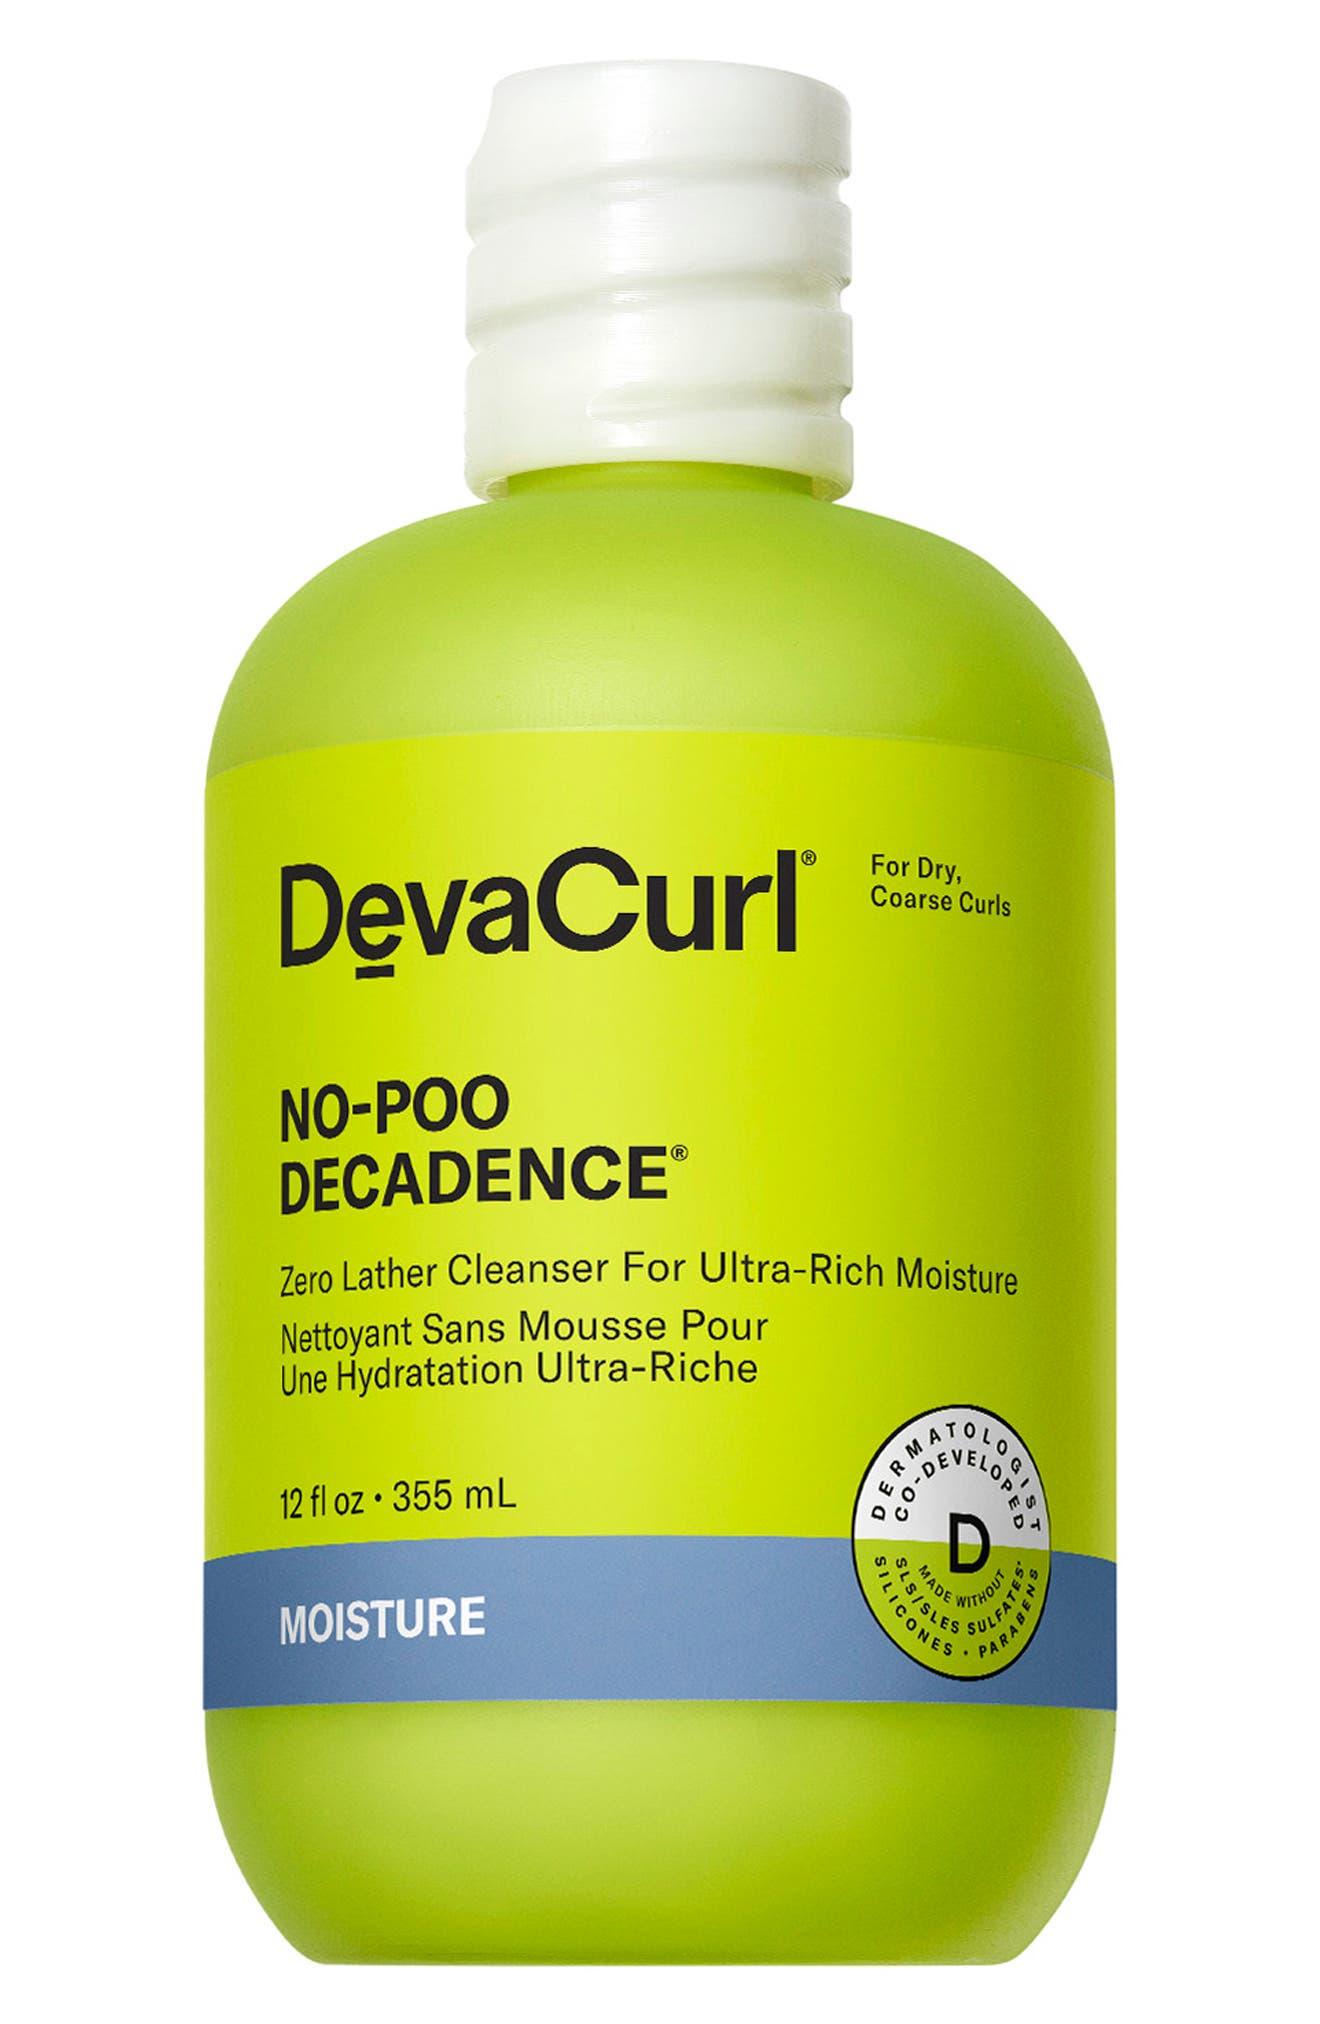 No-Poo Decadence Zero-Lather Cleanser